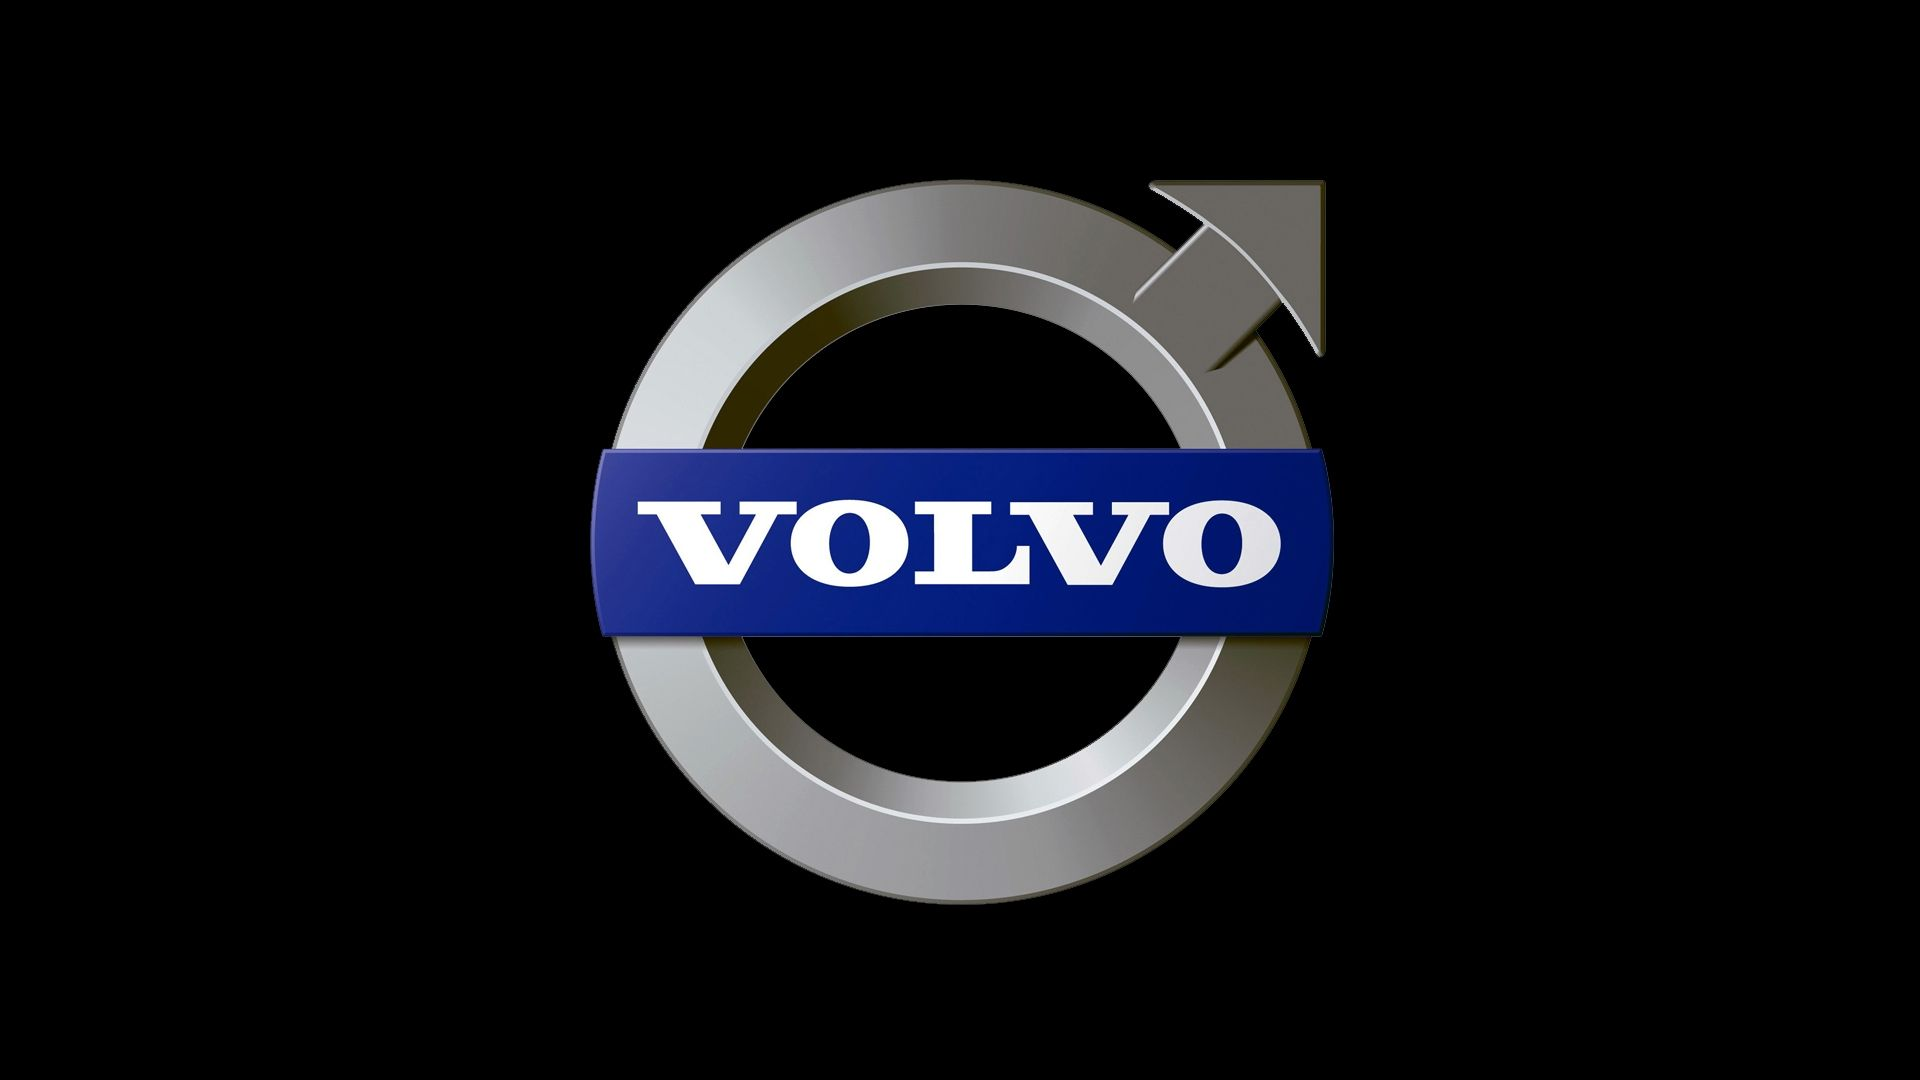 Volvo Logo Wallpaper Full HD ARO Cars 1920x1080